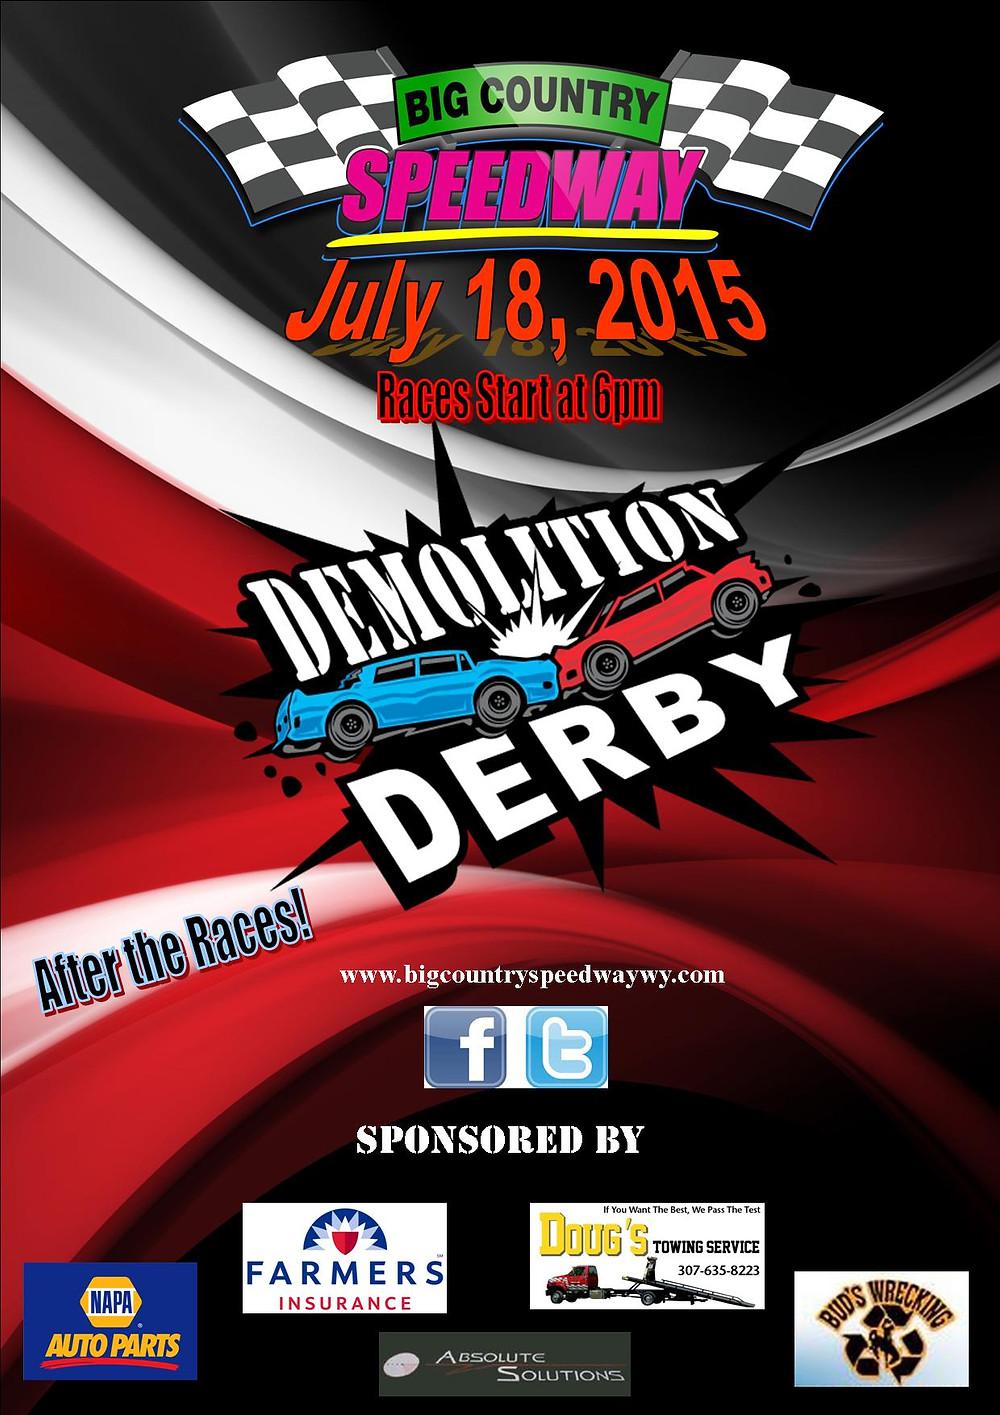 Big Country Speedway Demo Derby